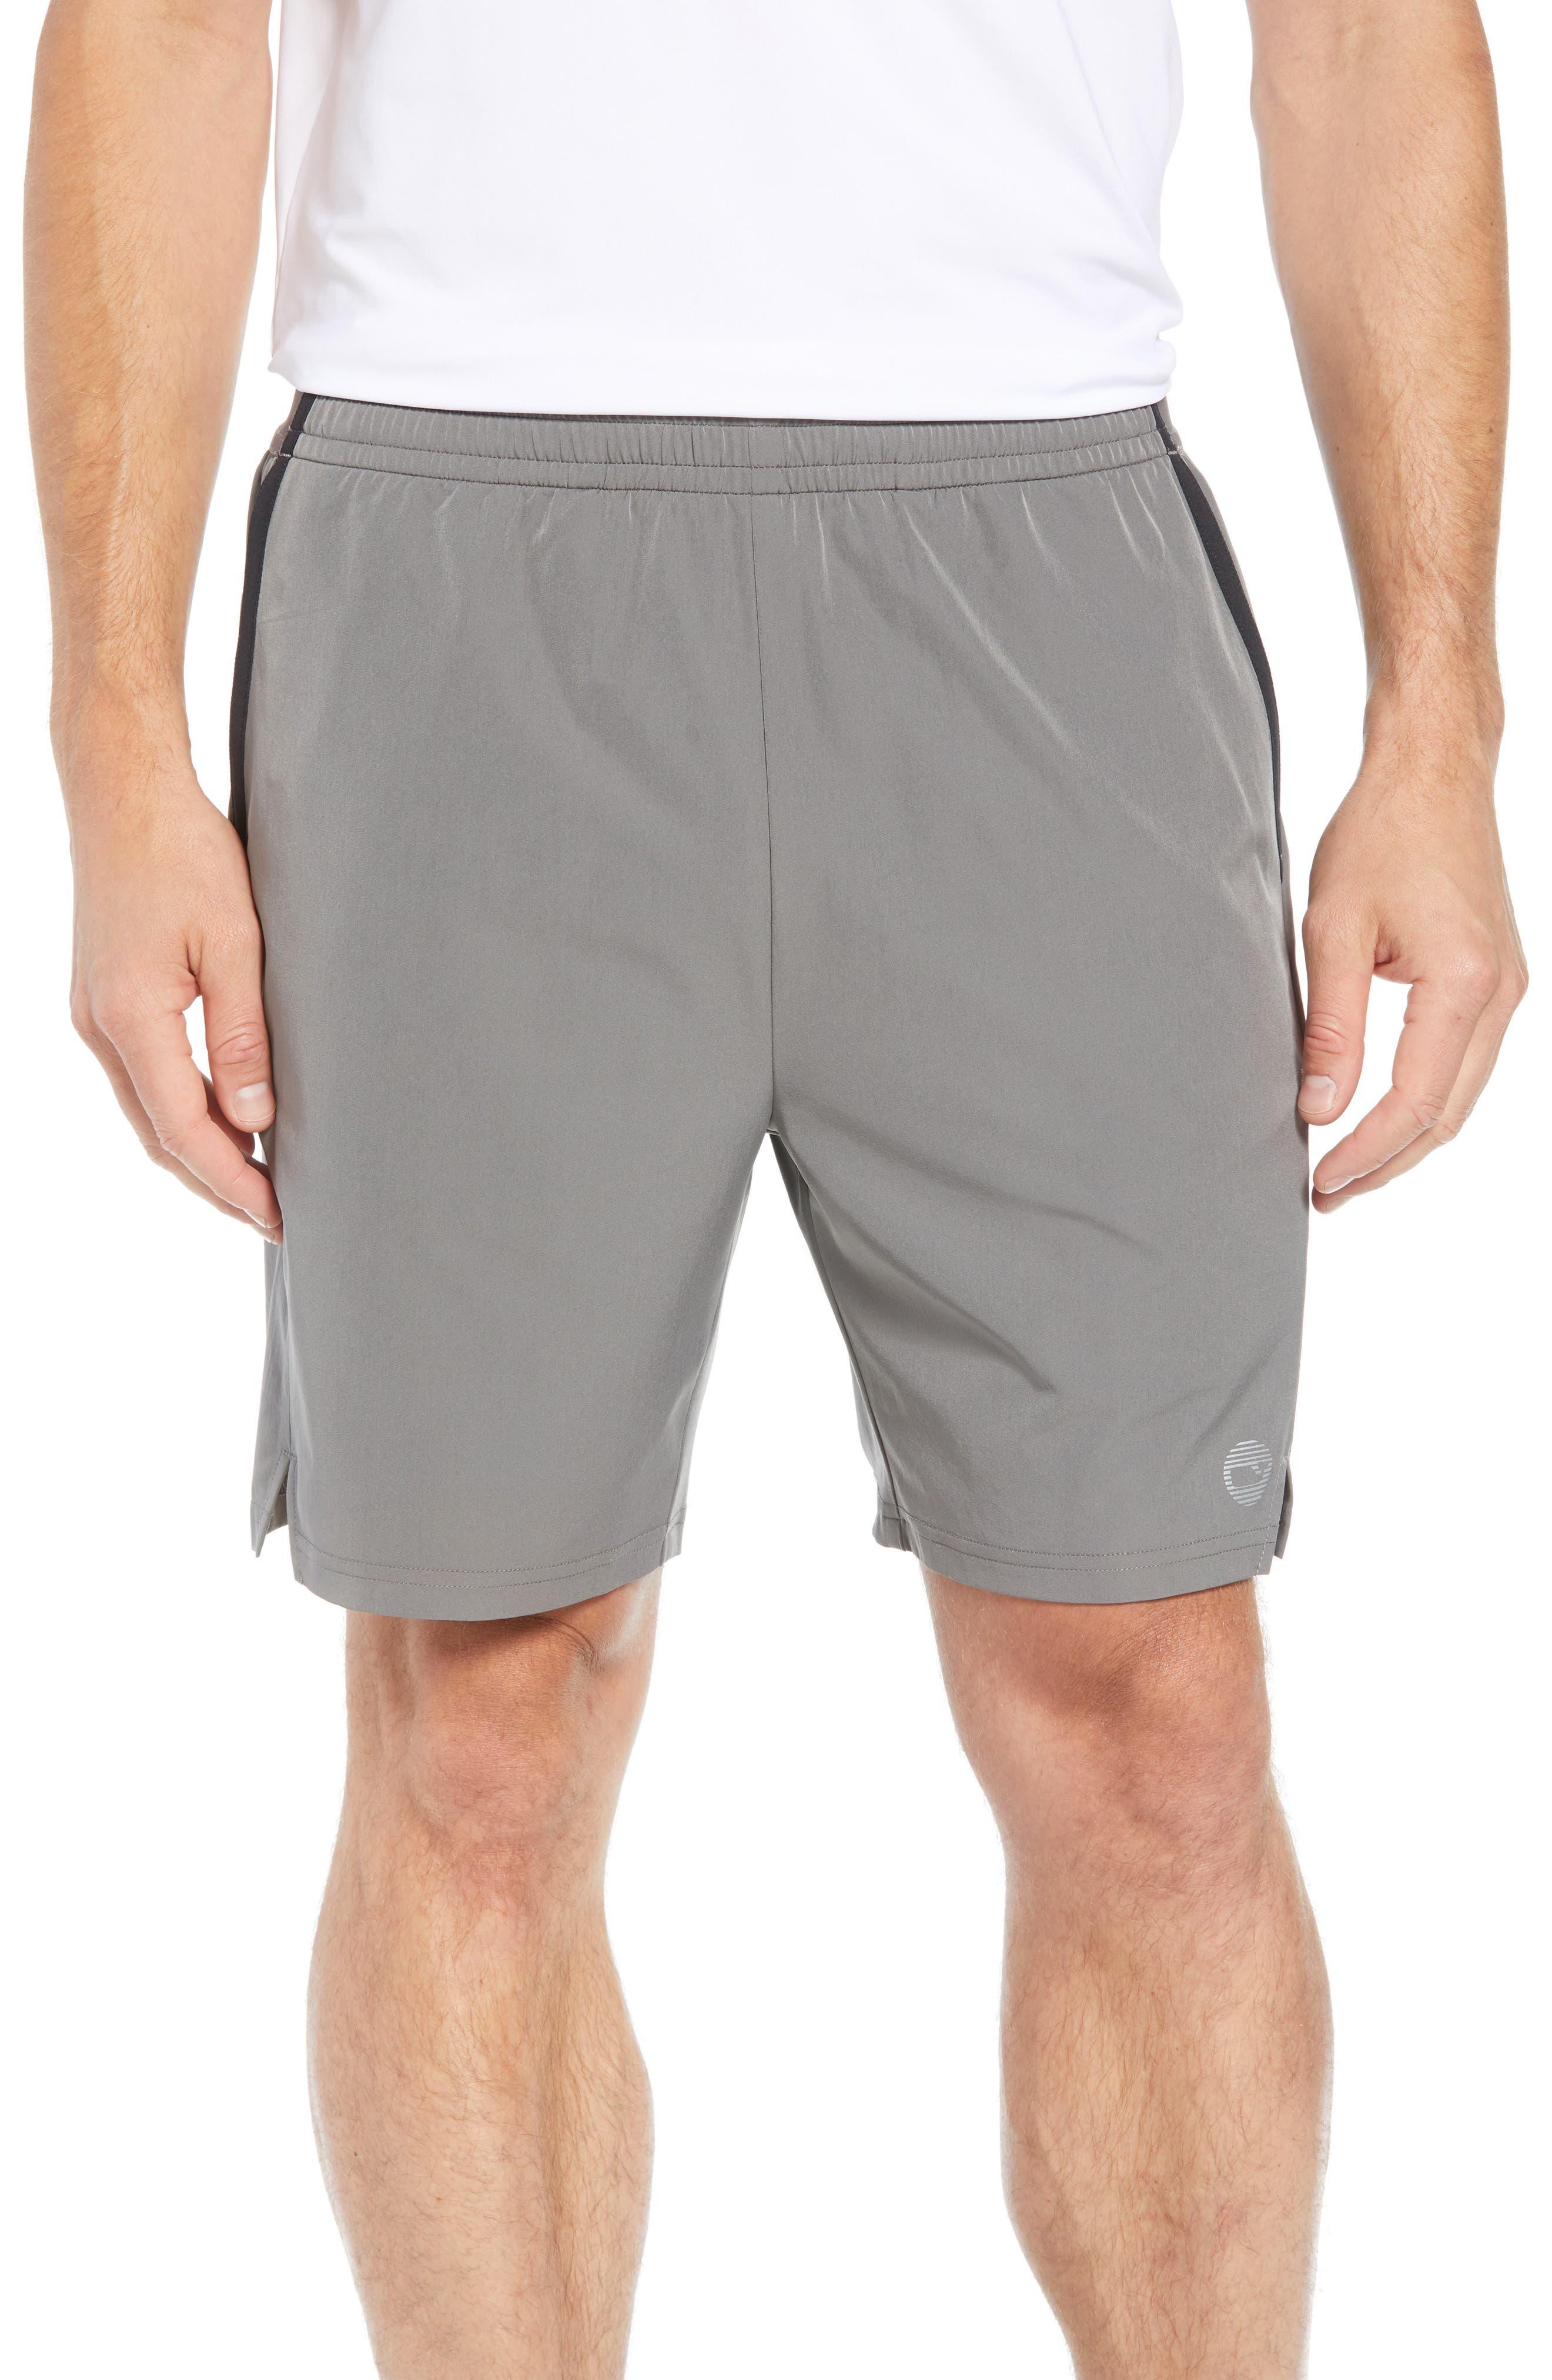 Active Tennis Shorts,                         Main,                         color, GRAPHITE